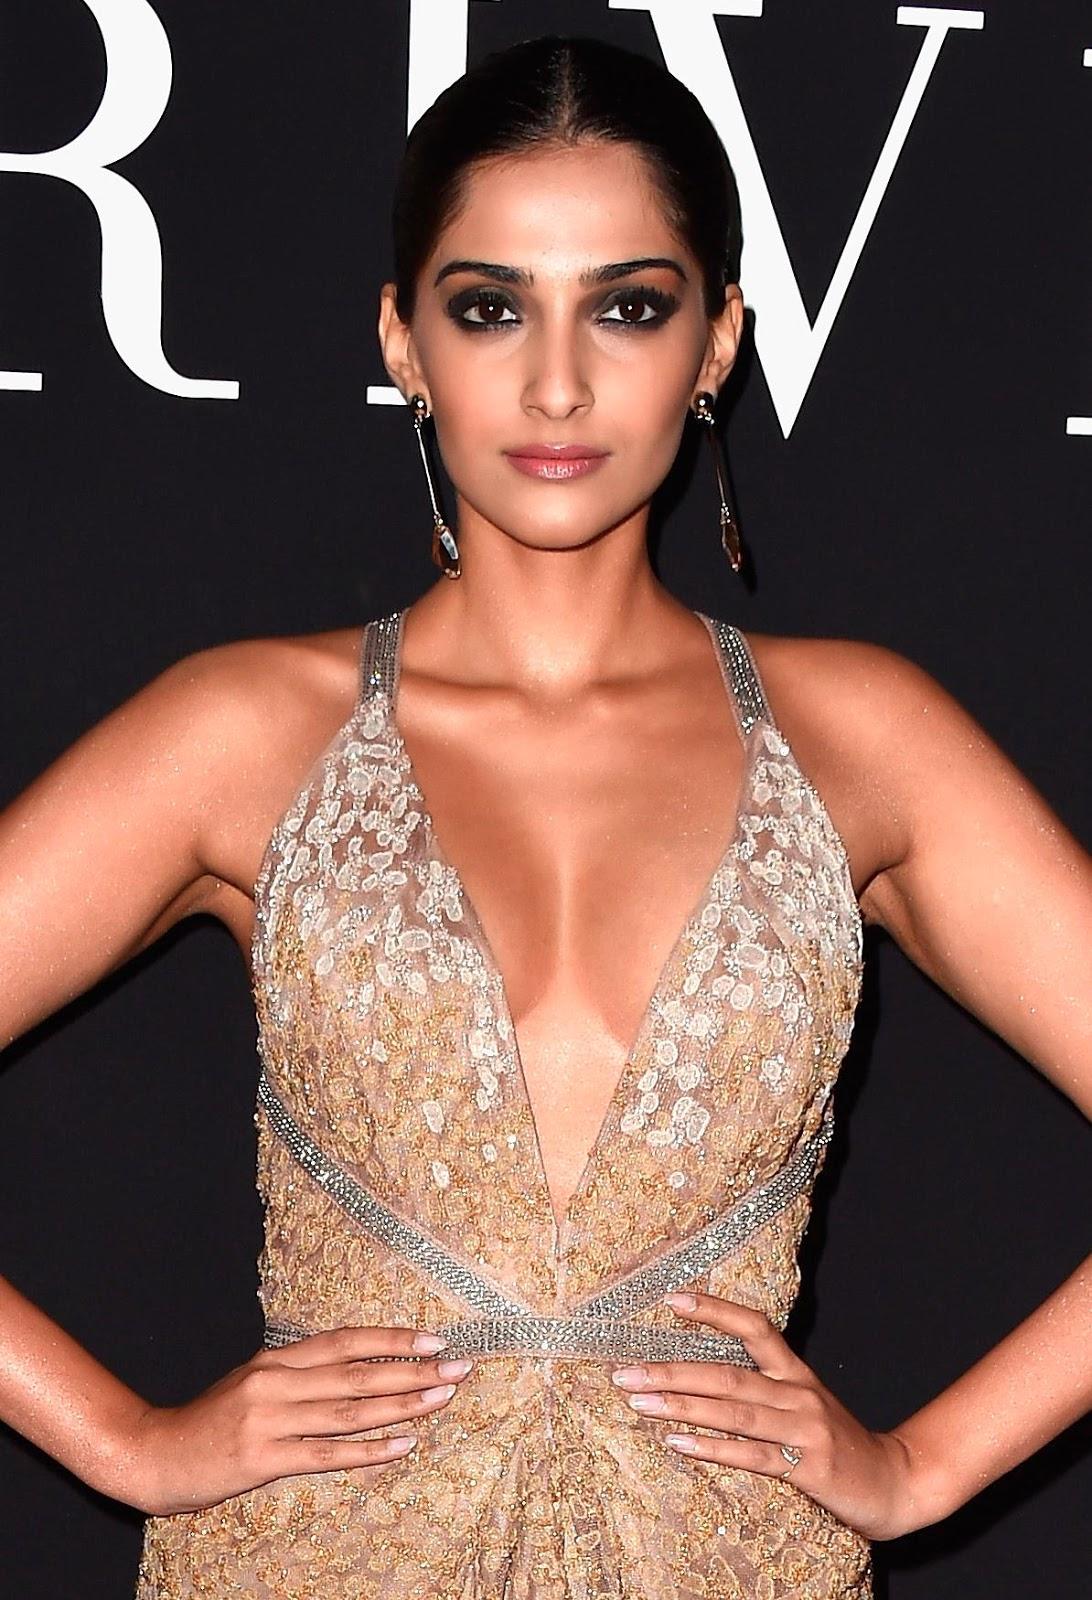 Indian Hot Actress Sonam Kapoor Sizzling Photos In Pink Dress